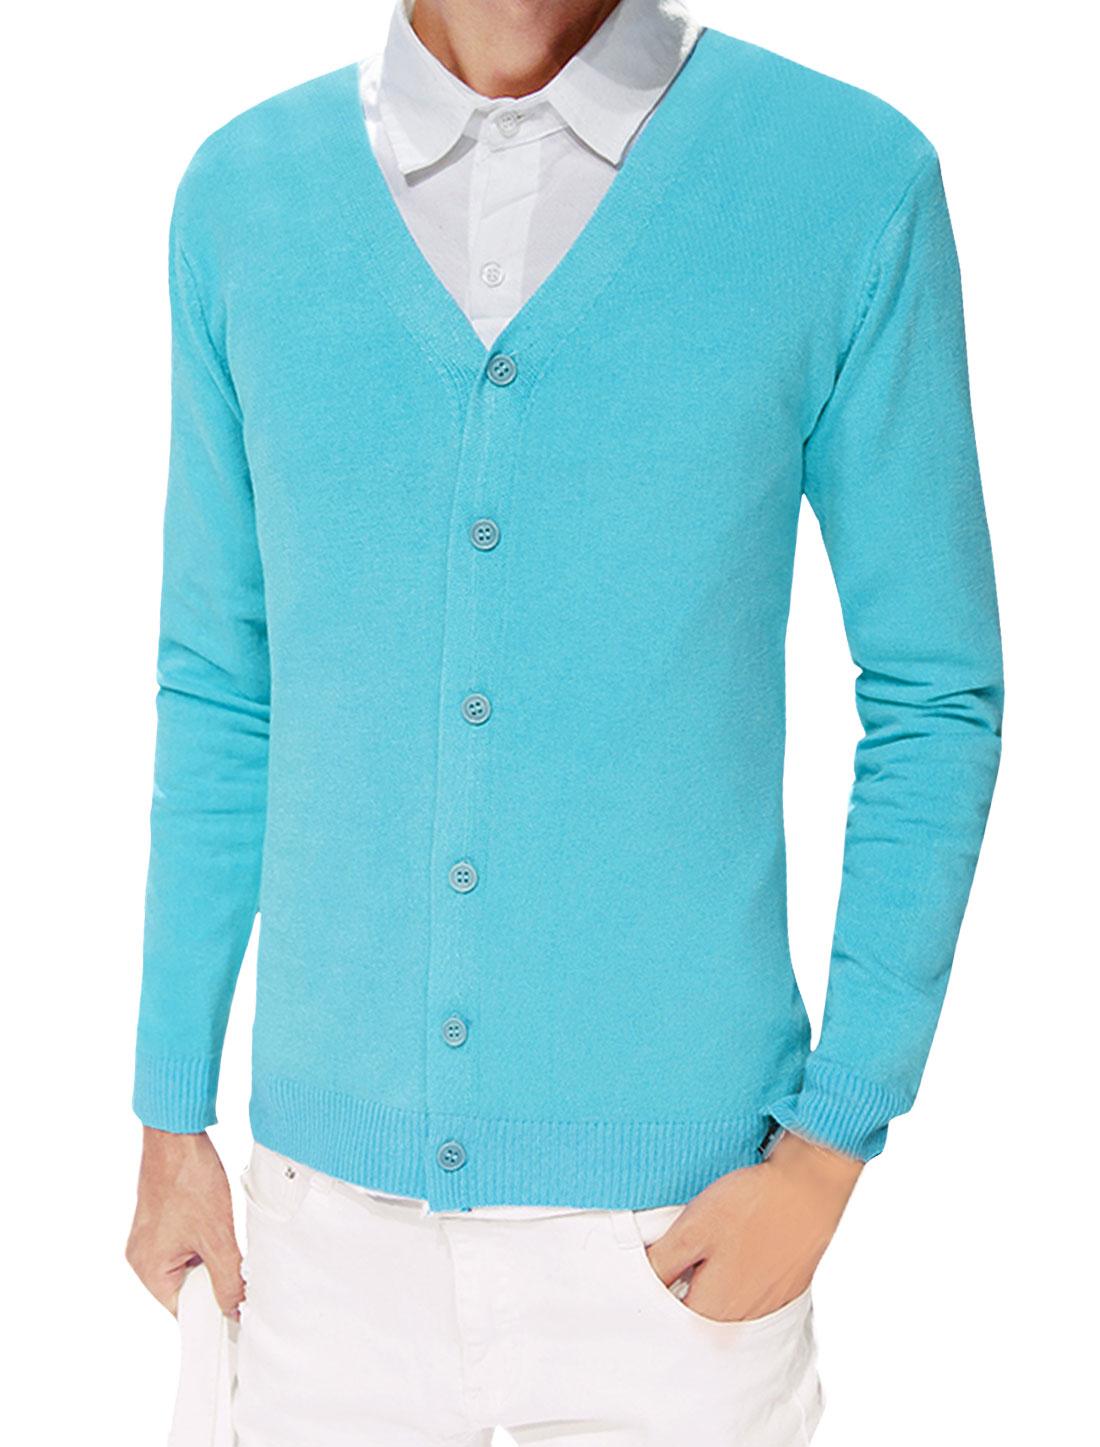 Men Button Closure Long Sleeves V Neck Slim Fit Knit Cardigan Aqua S